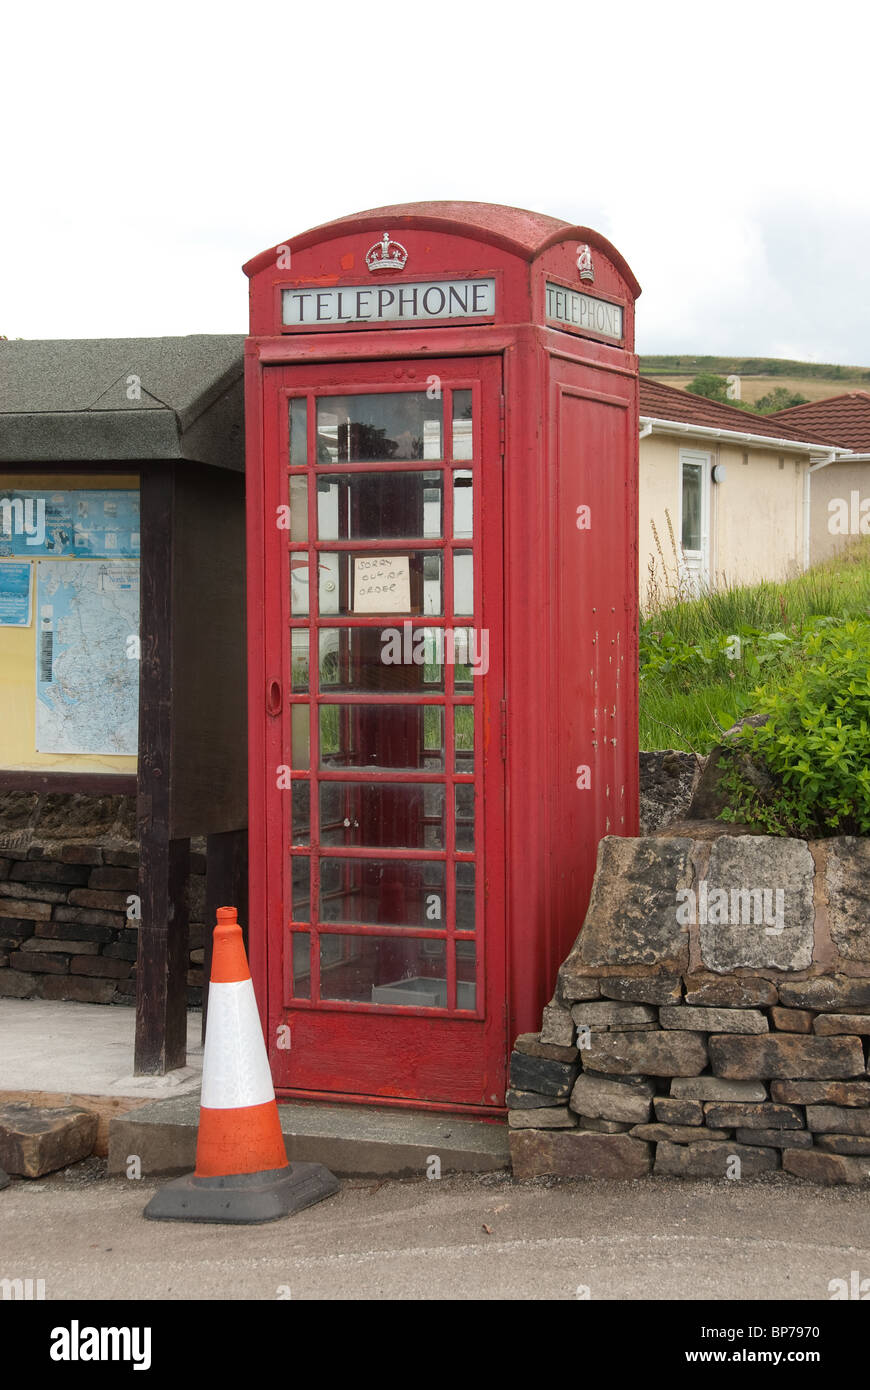 Disused Telephone kiosk - Stock Image